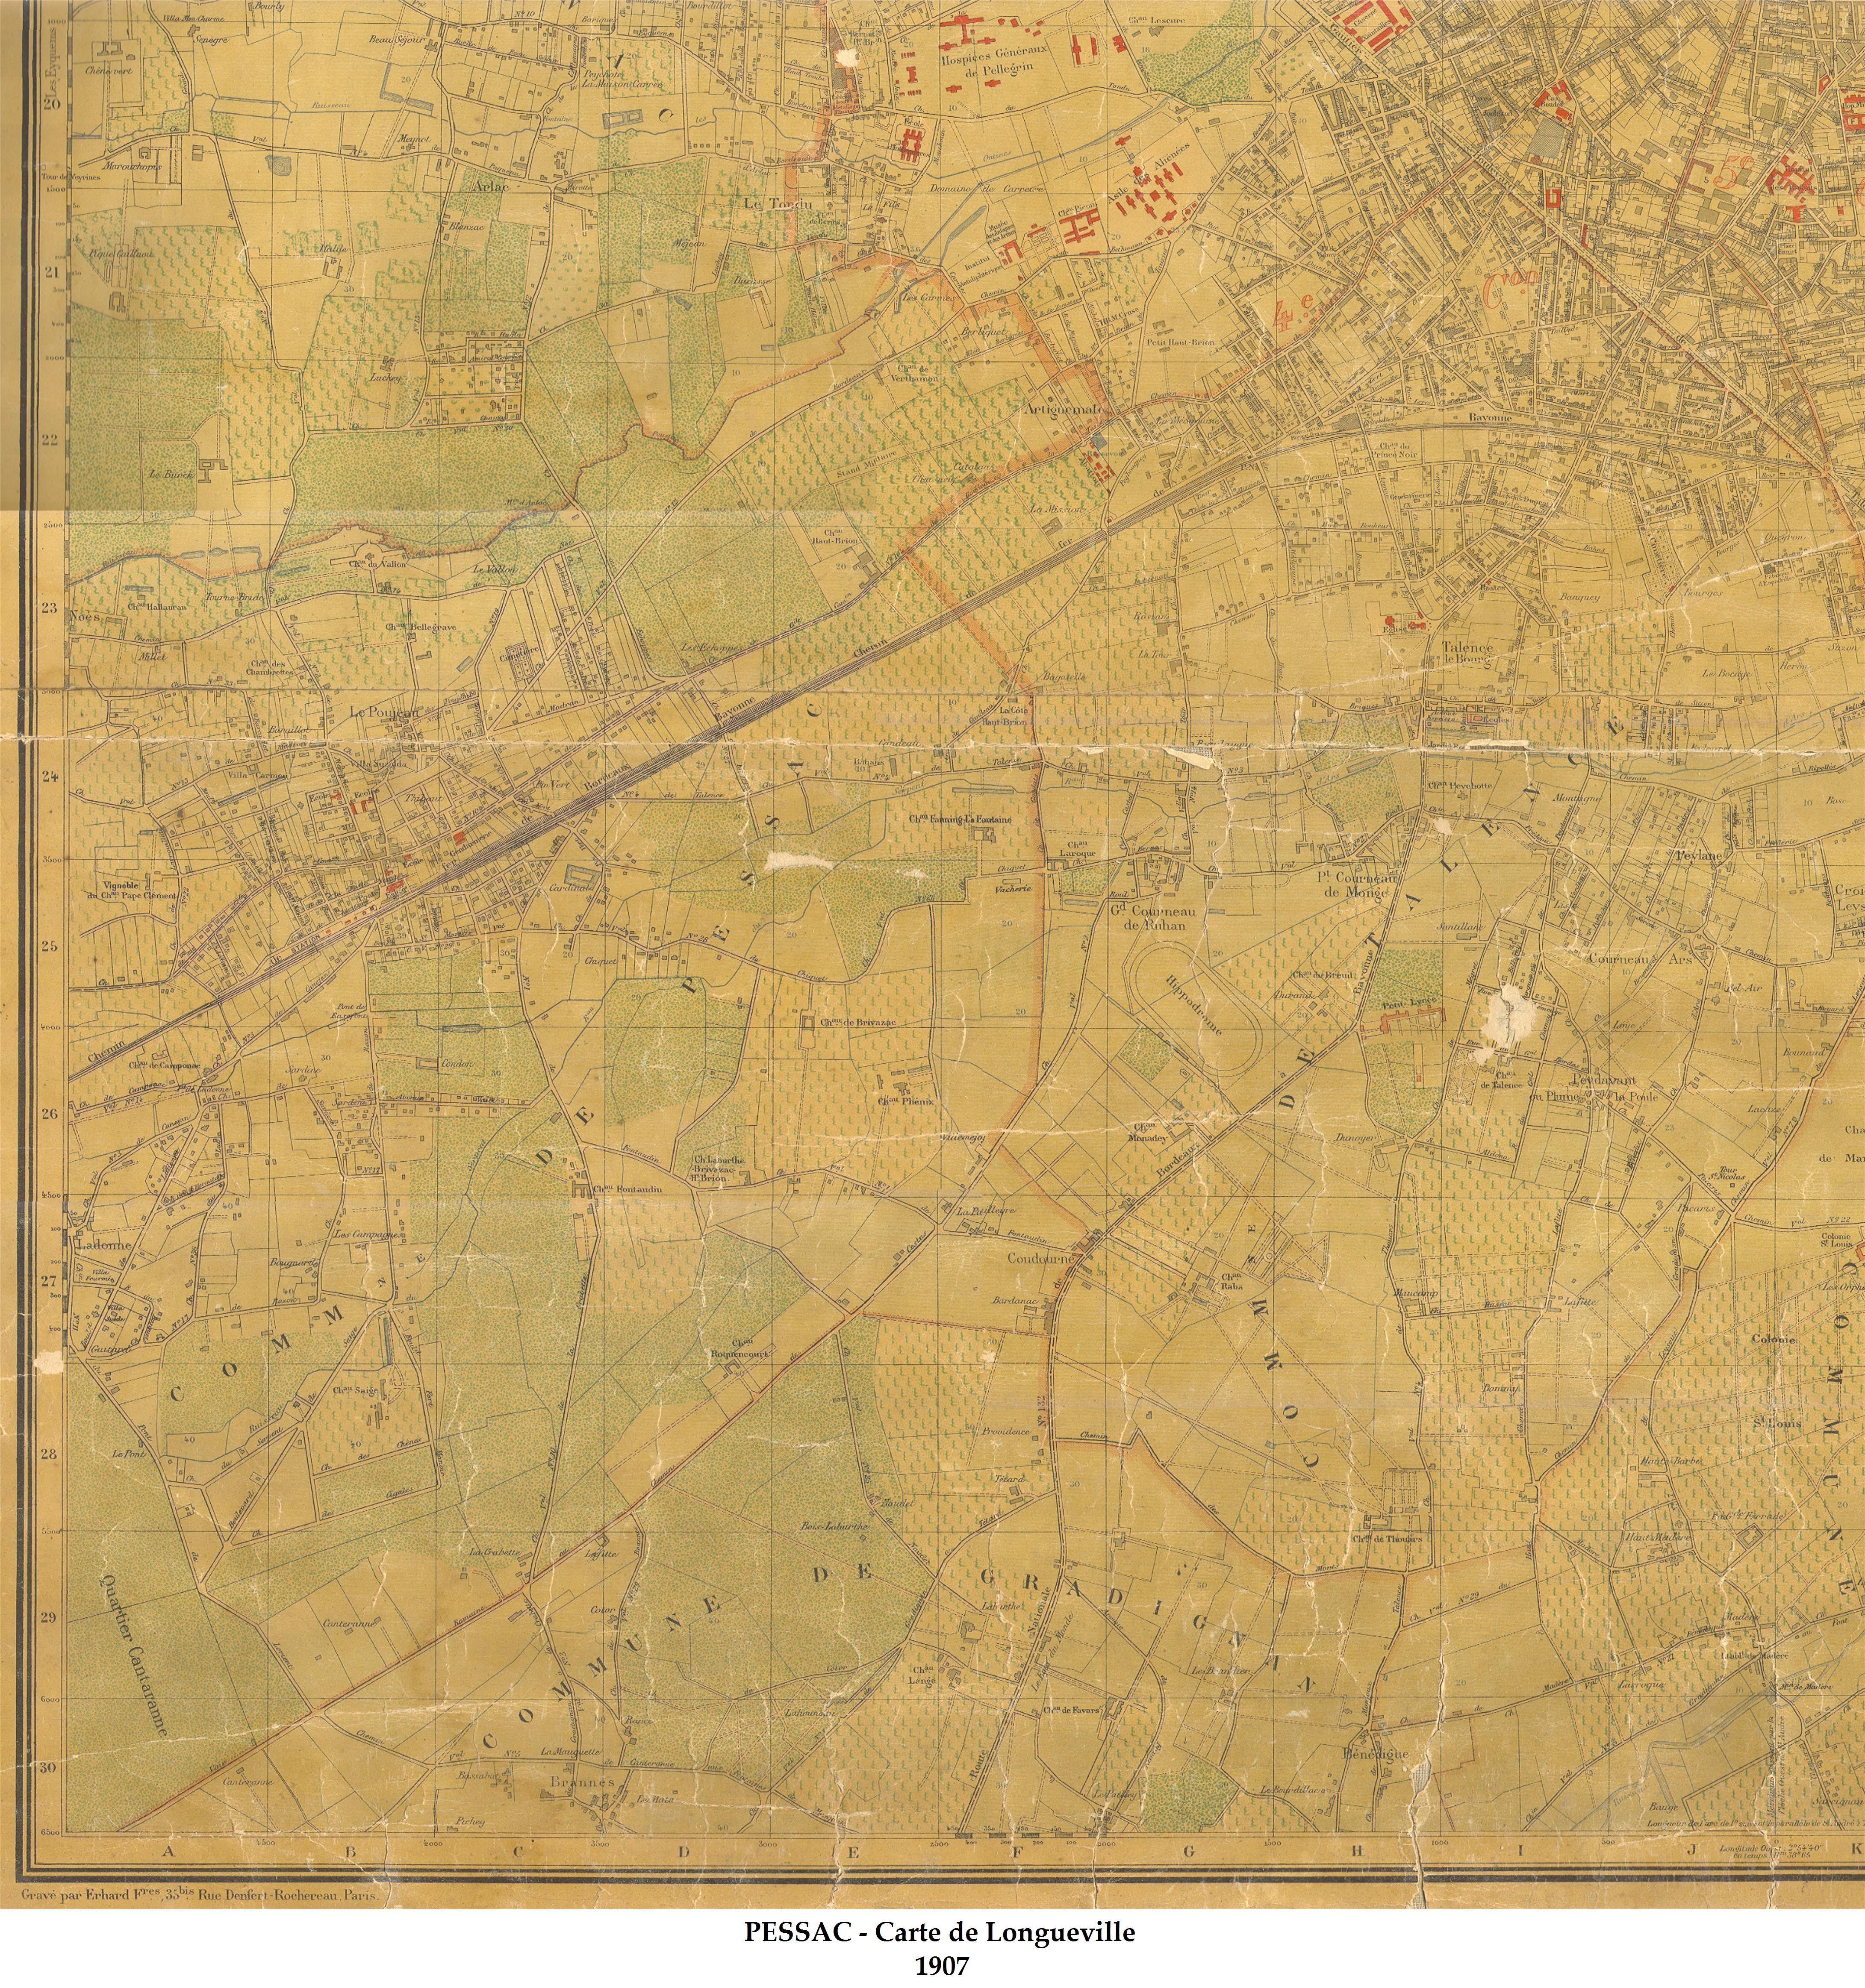 Carte de Longueville (1907)